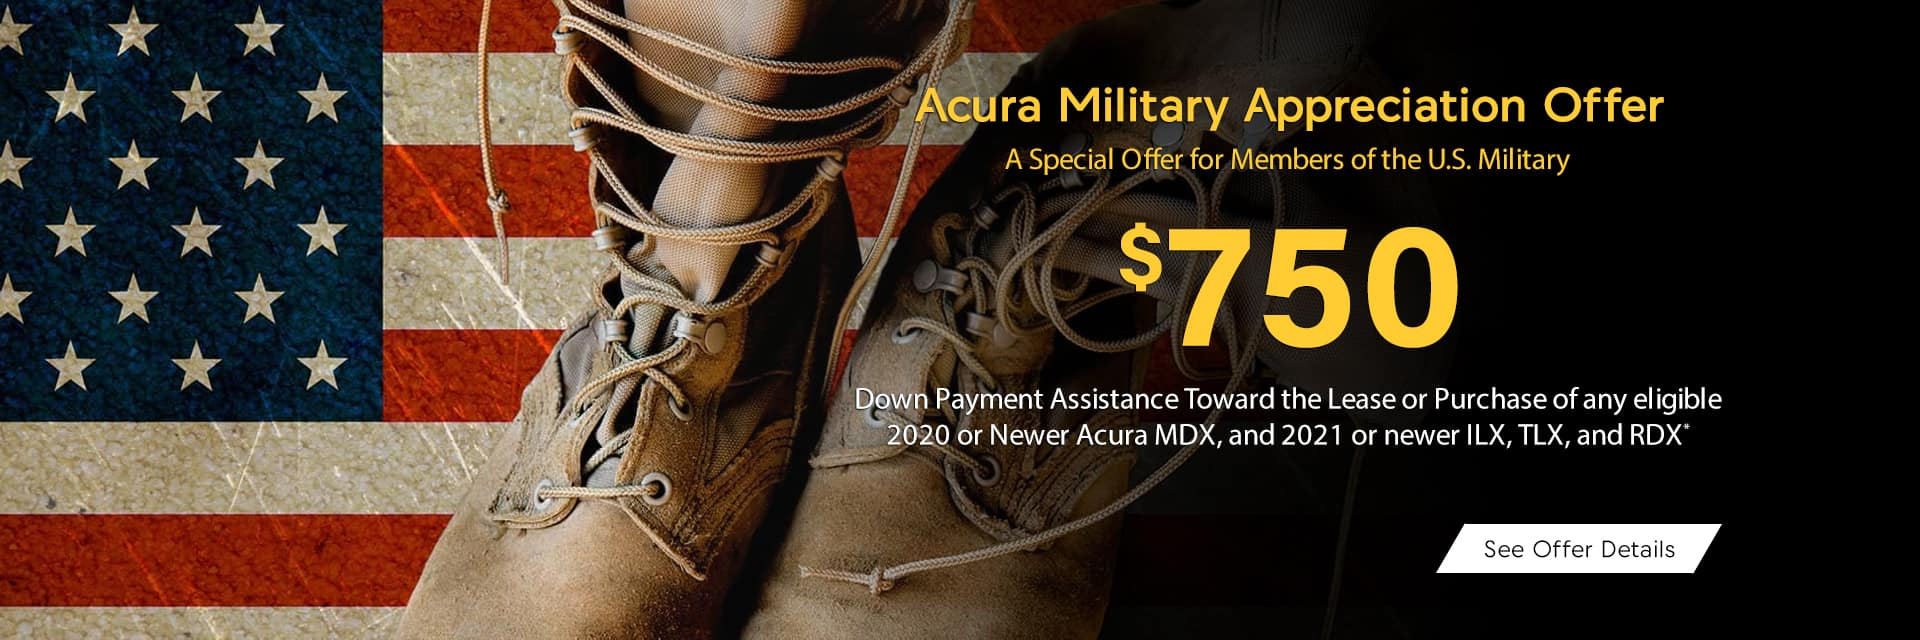 Acura Military Appreciation Offer Sunnyside Acura Nashua NH 03063